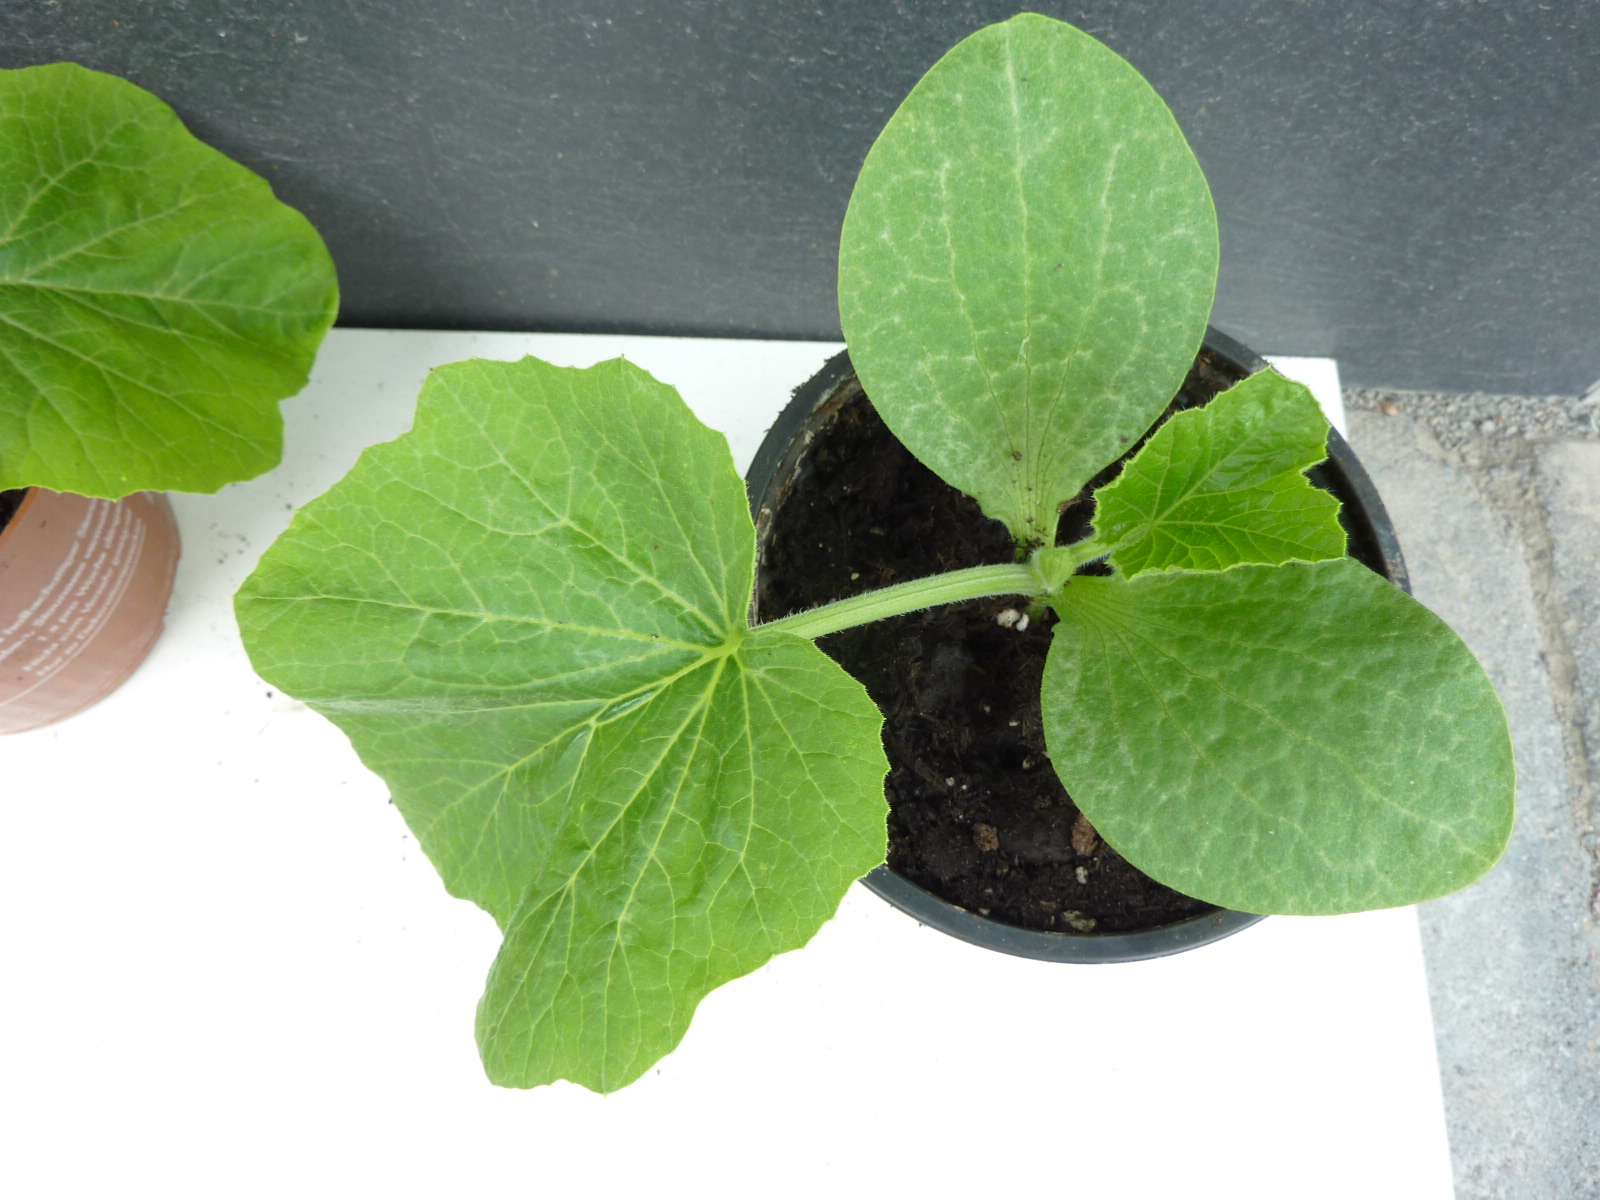 hokkaido 2 pflanzen jungpflanze setzling speisek rbis zucchini pflanze top ebay. Black Bedroom Furniture Sets. Home Design Ideas